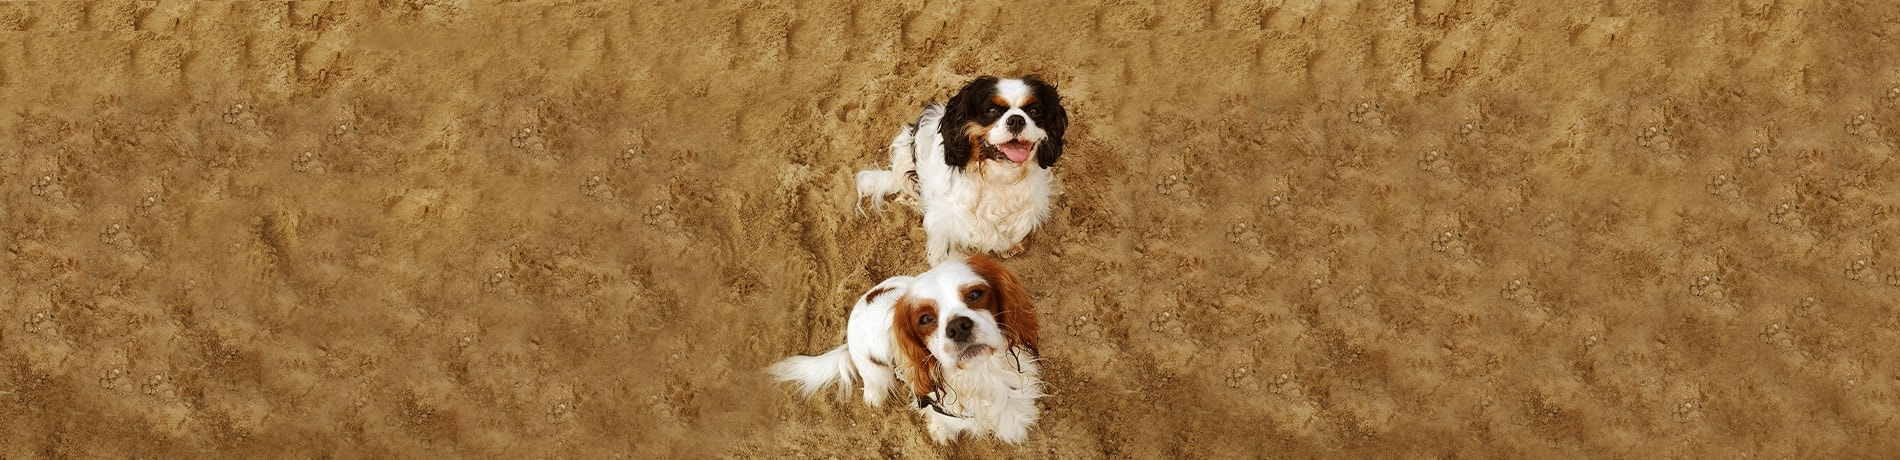 header interview dogfluencer